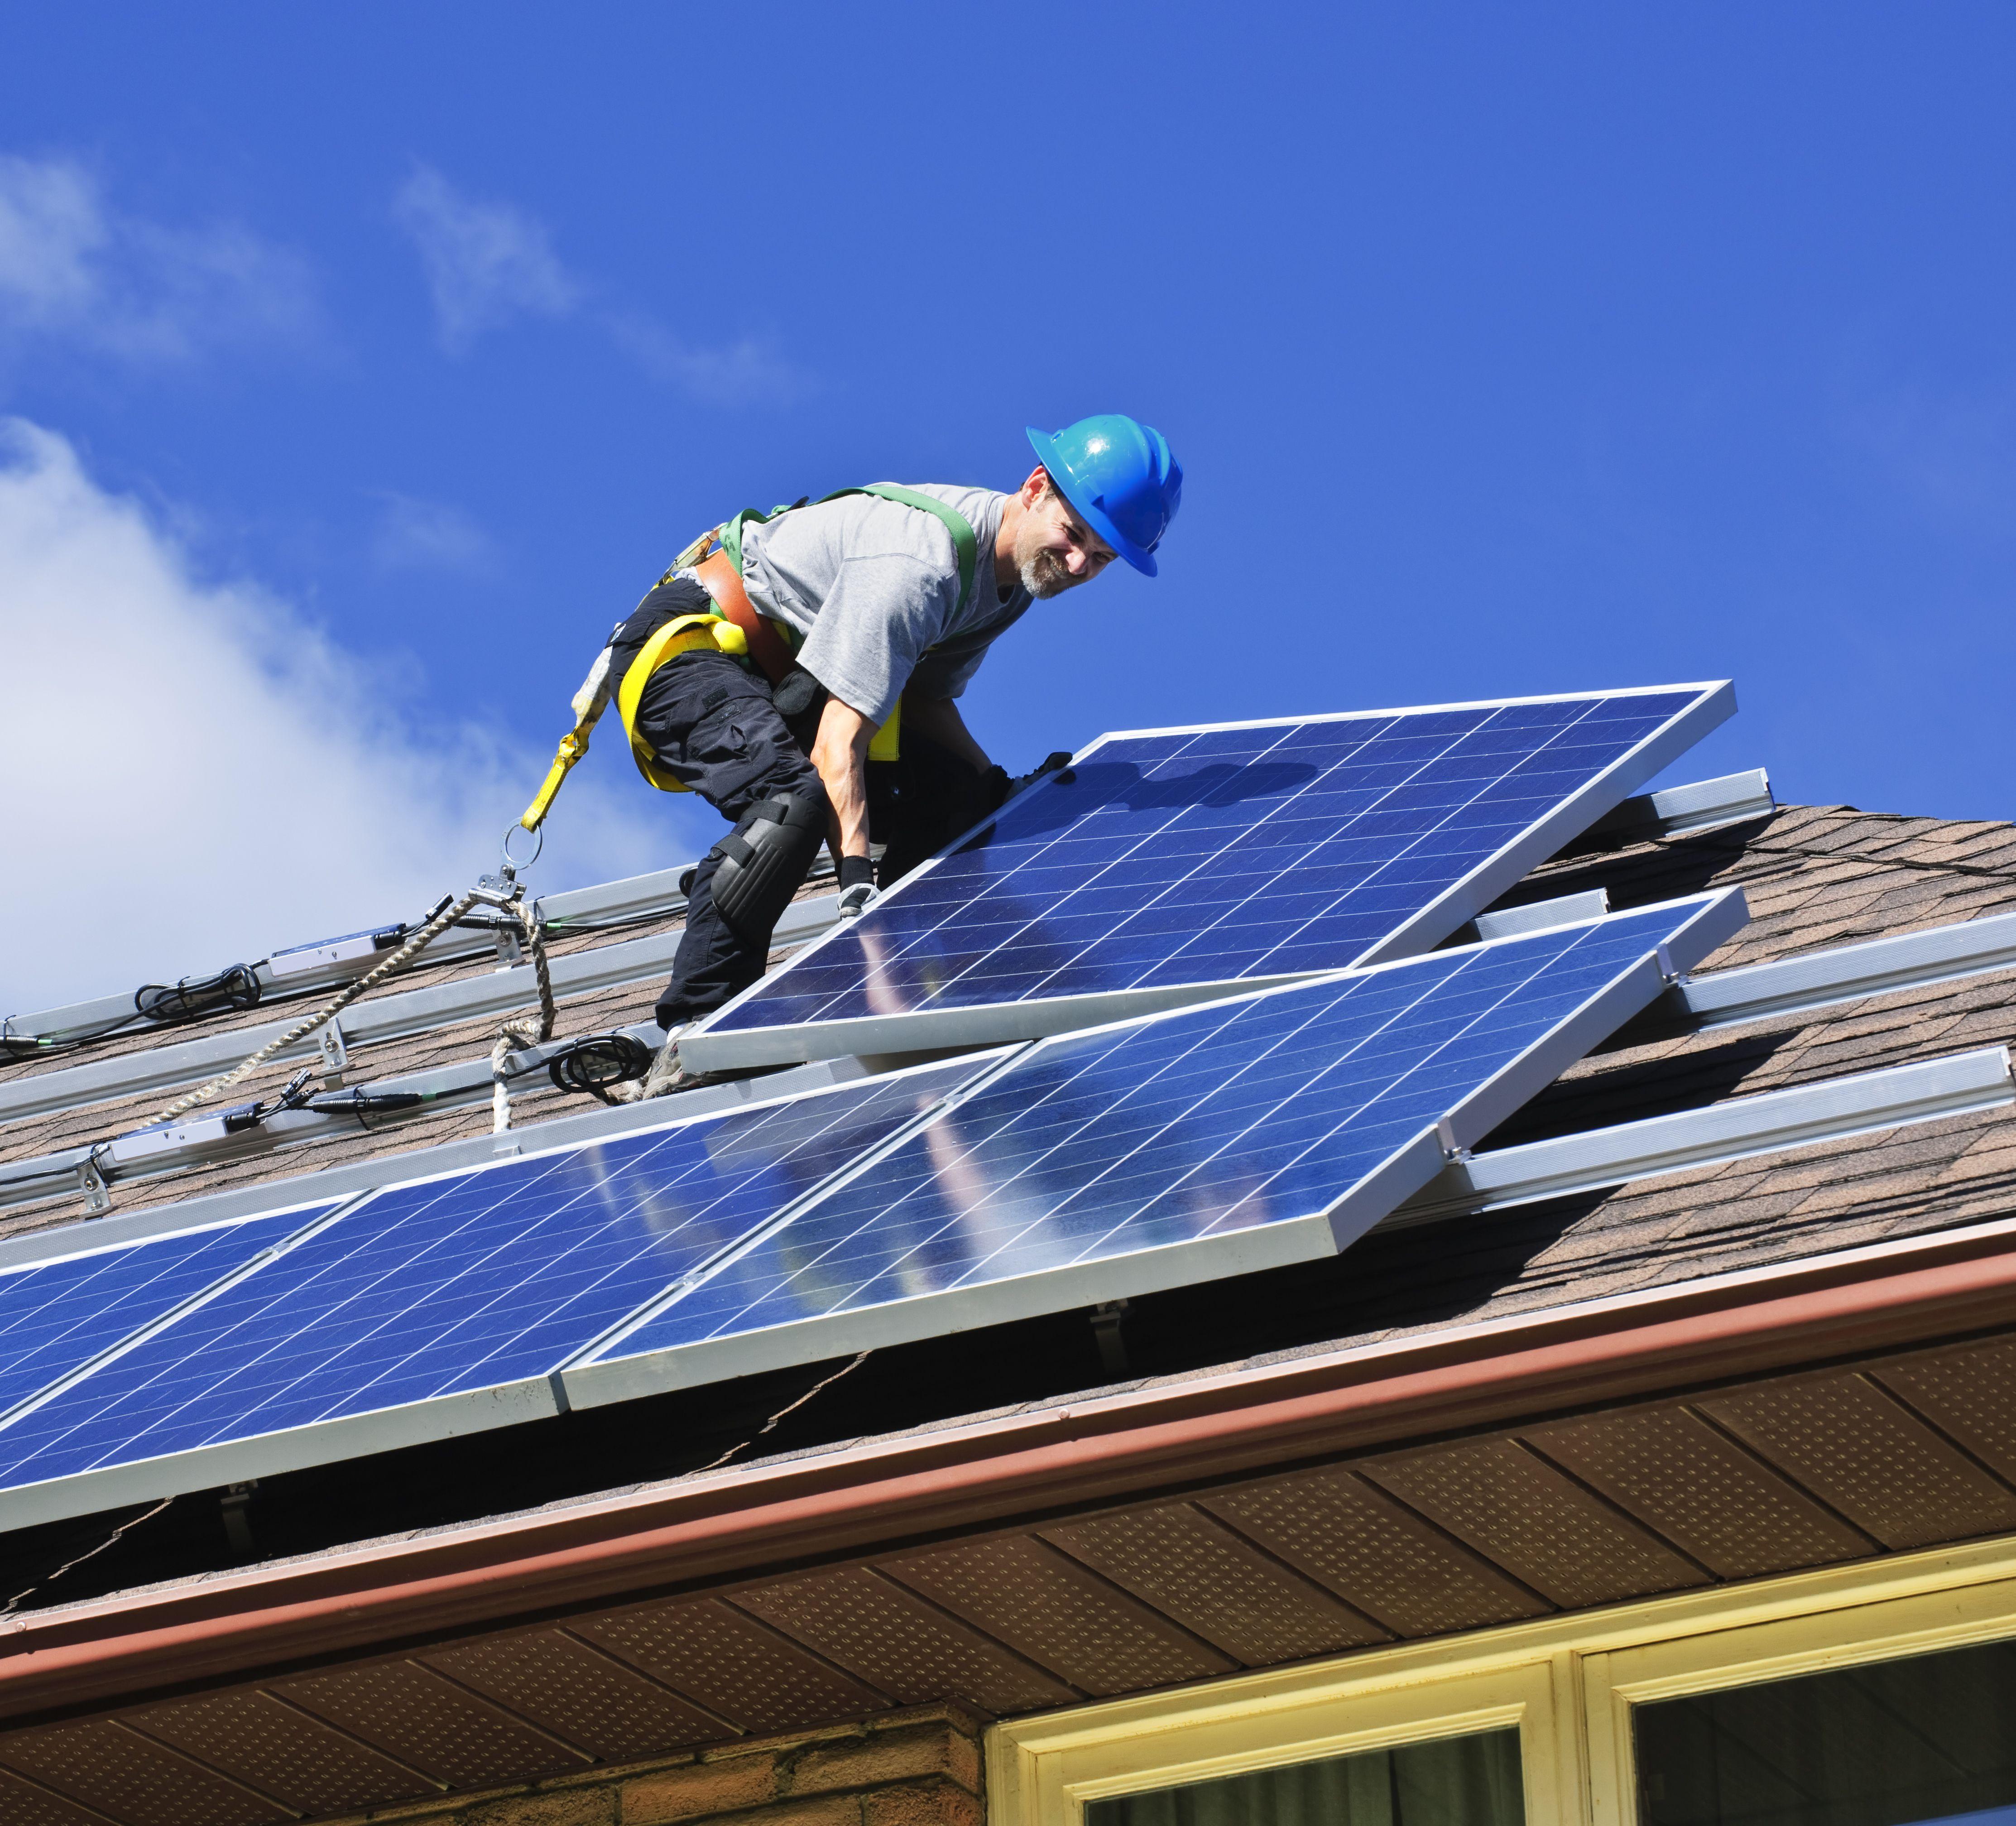 Preventive Solar Of Utah 801 602 8040 Solar Energy Visit Us At Www Preventivesolarutah Com Solar Panels Solar Installation Residential Solar